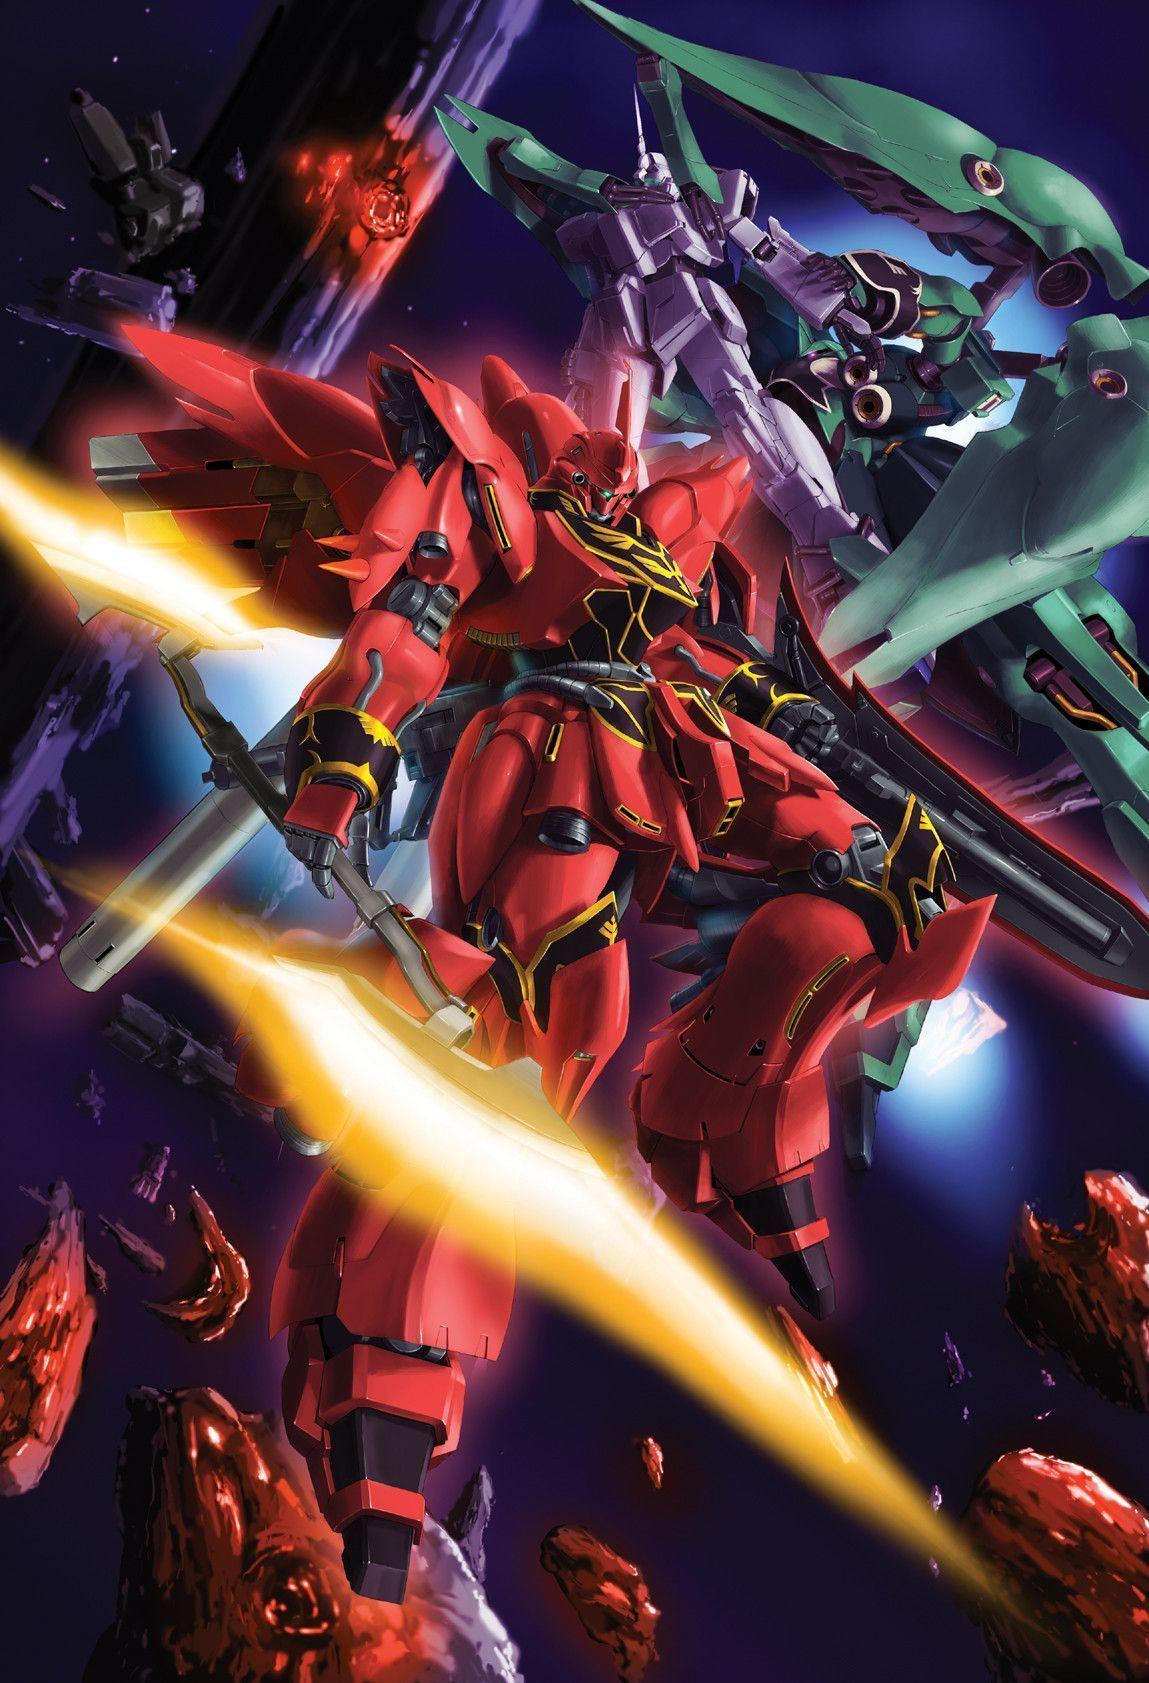 Iphone X Live Wallpaper App Gundam Unicorn Wallpapers Wallpaper Cave